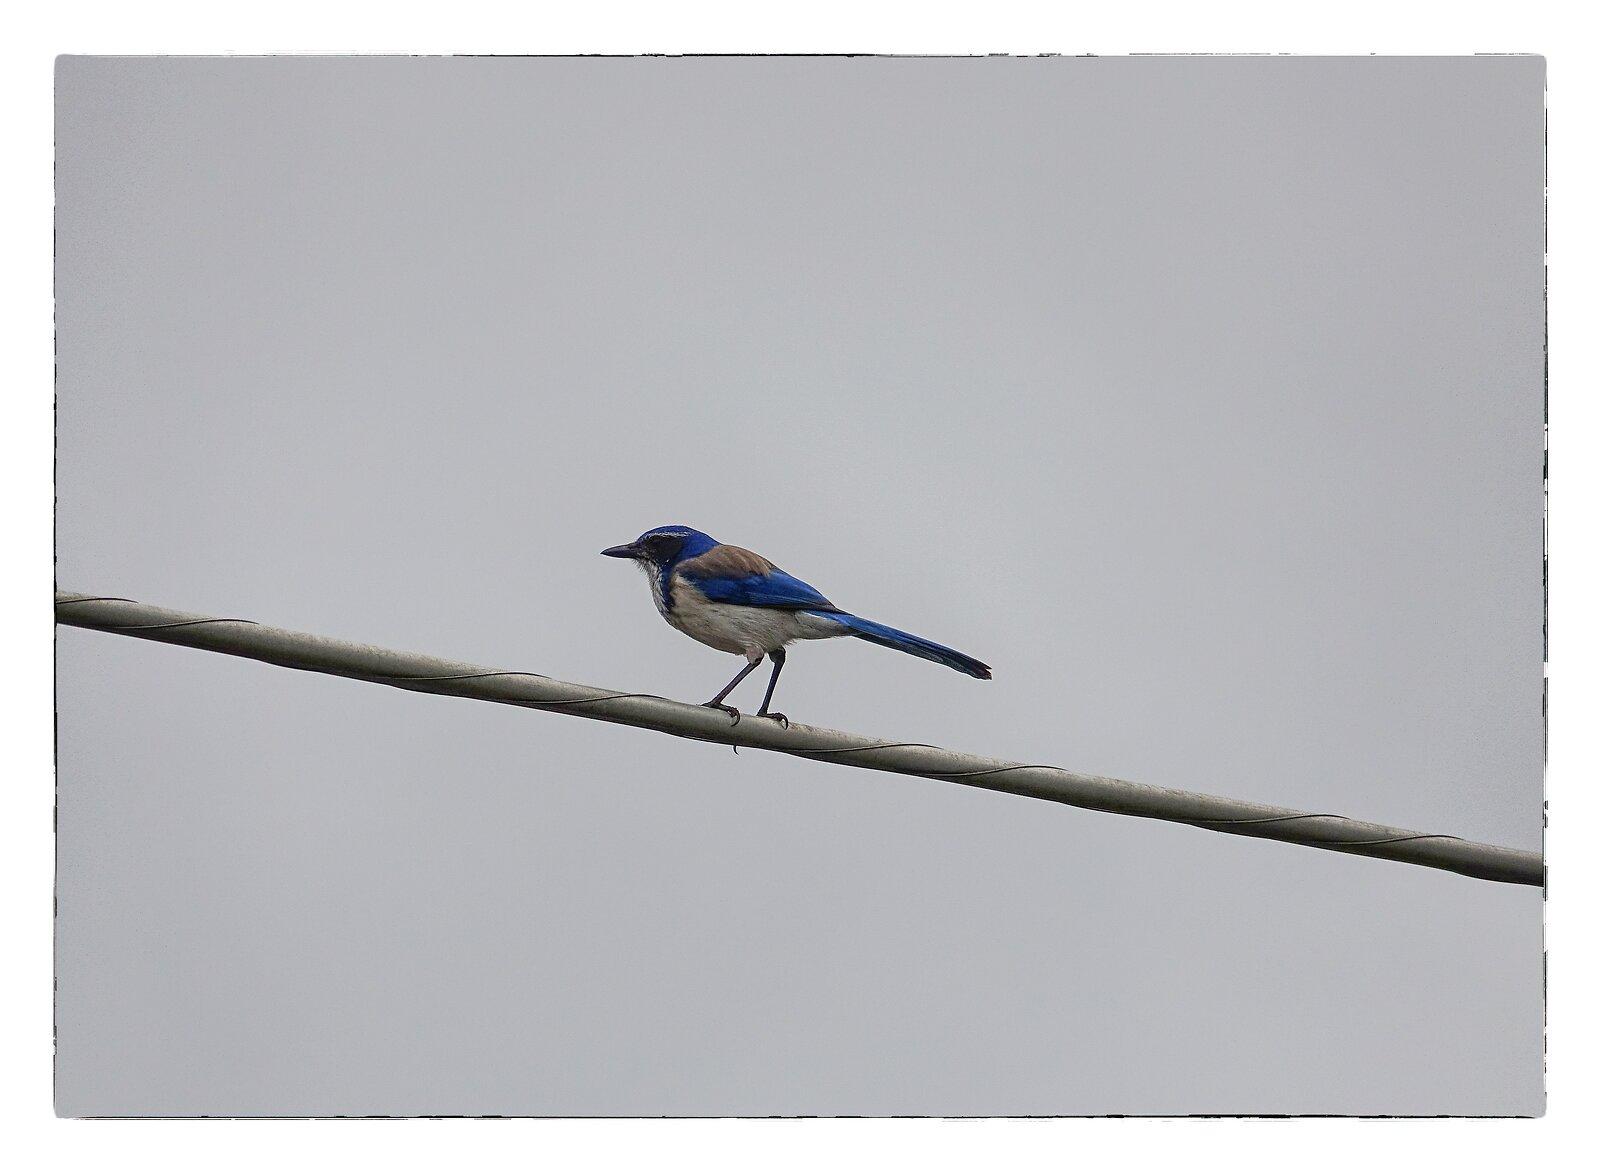 RX10_Mar22_21_blue_jay_on_telephone_wire.jpg